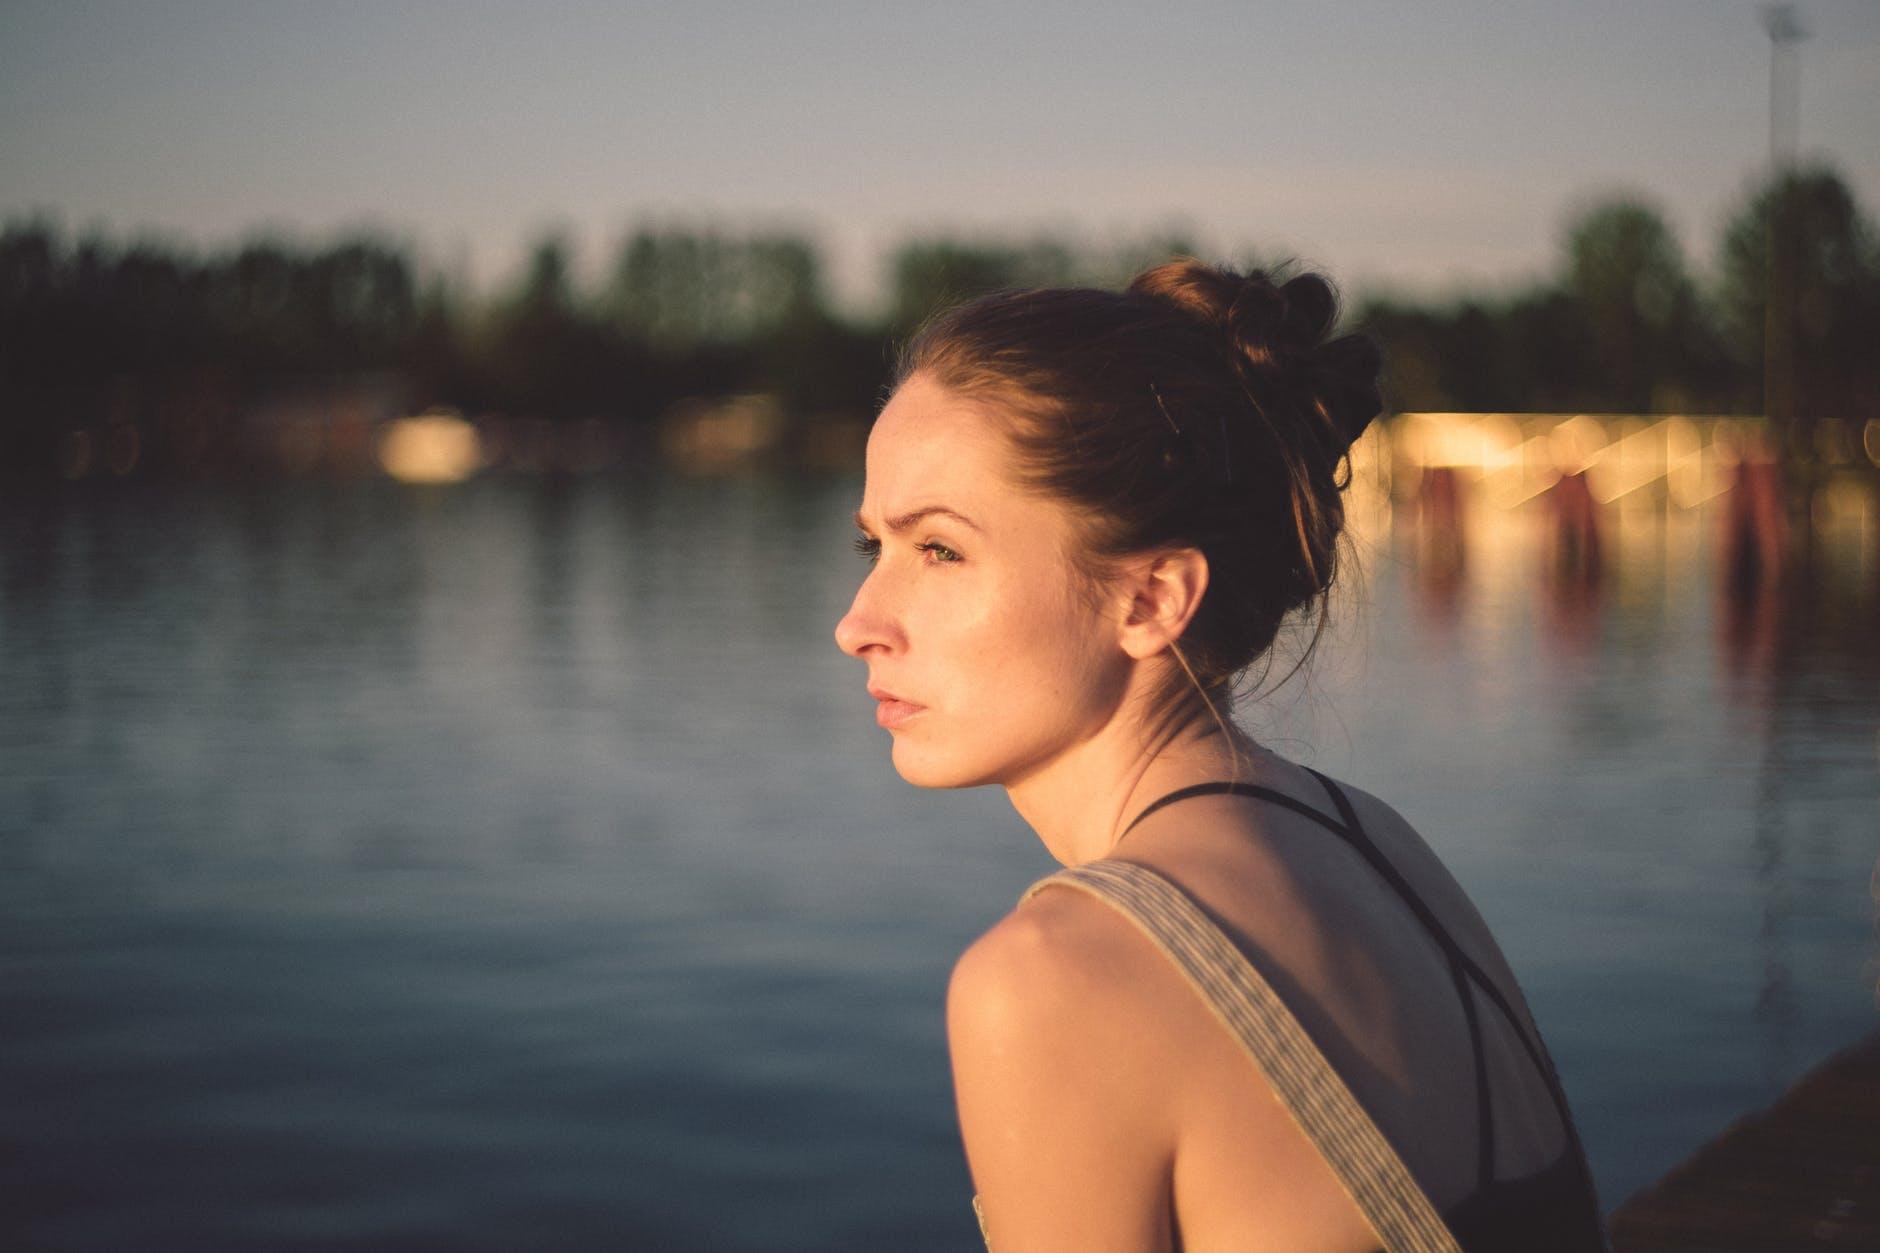 meditation benefit work performance